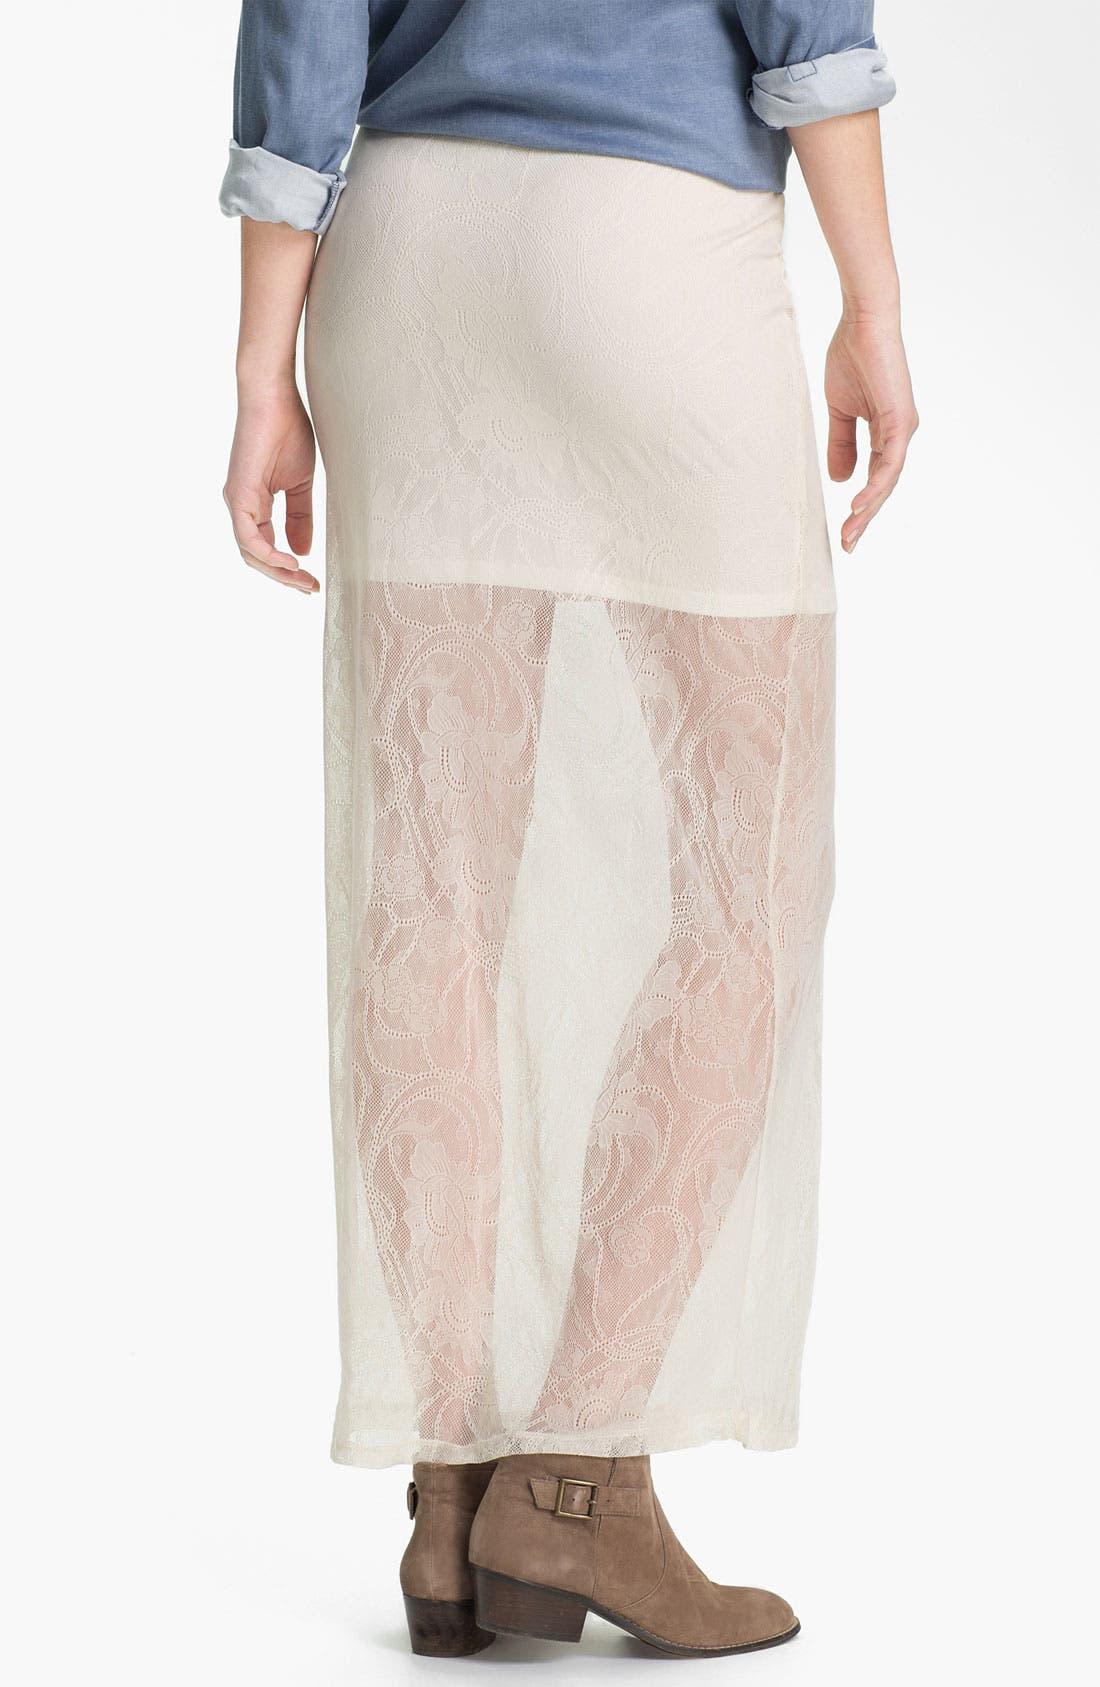 Alternate Image 2  - h.i.p. Half Sheer Lace Maxi Skirt (Juniors)